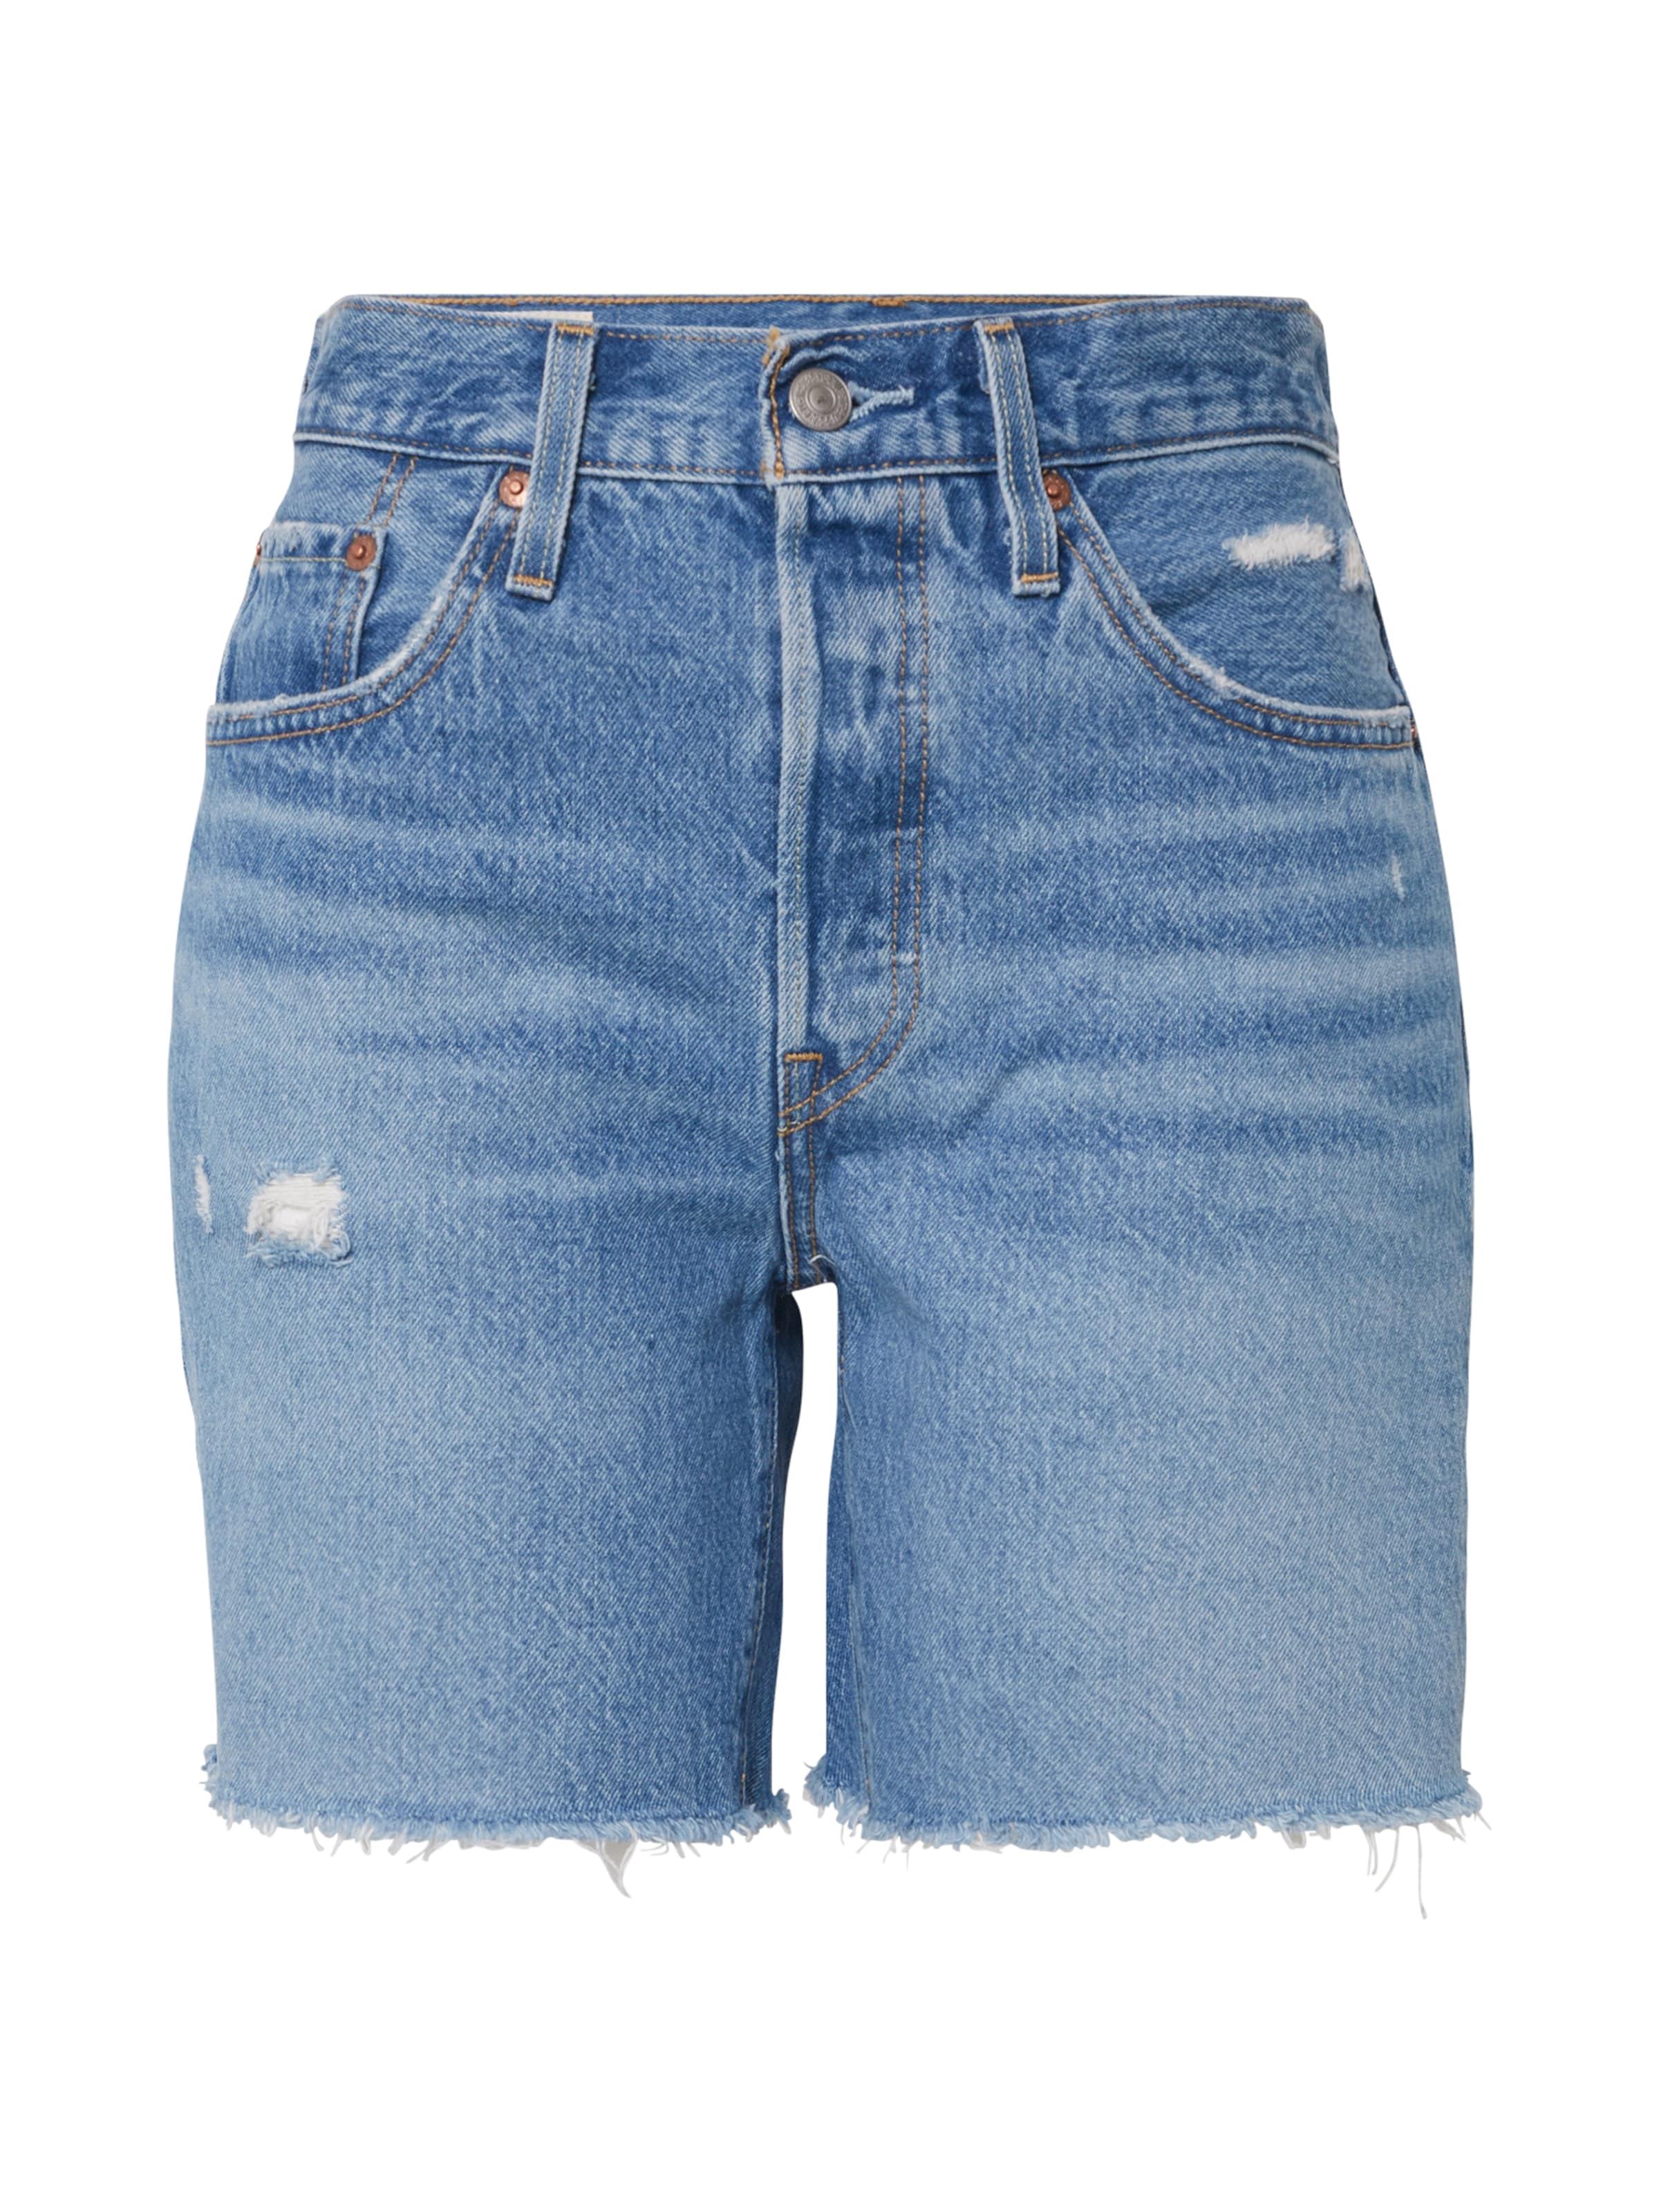 LEVI'S Jeans i blå denim